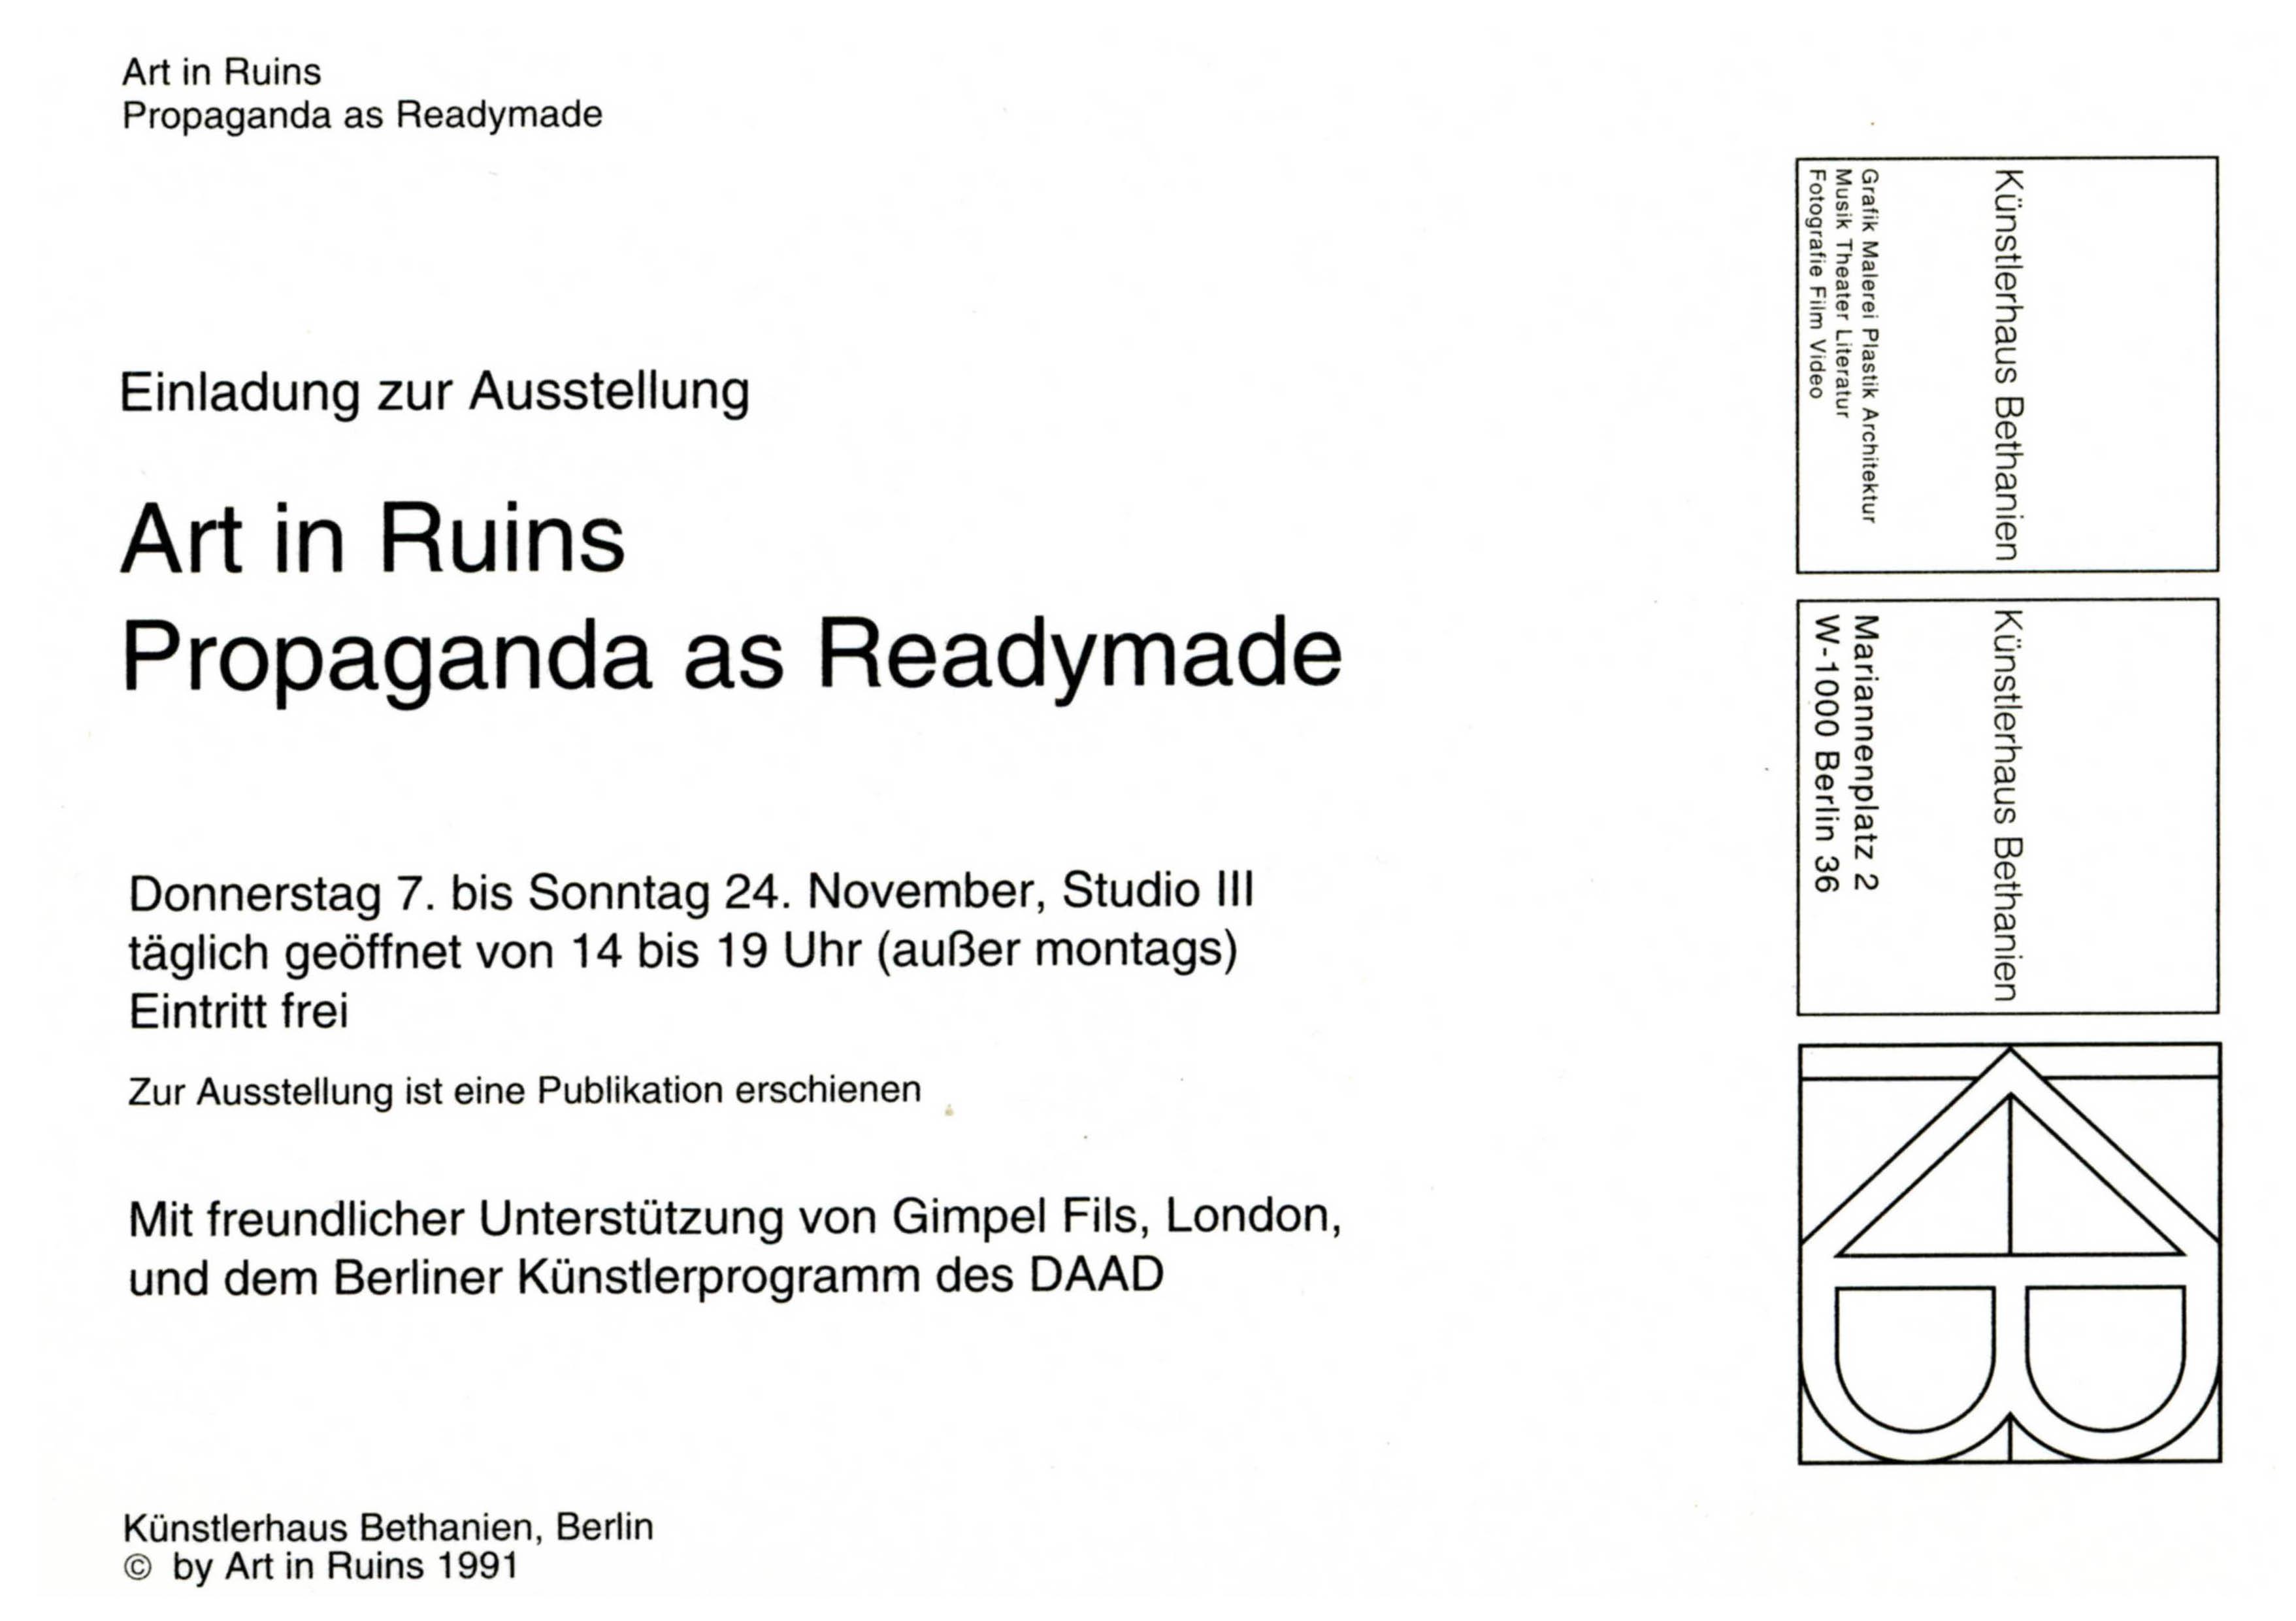 'PROPAGANDA AS READYMADE' Künstlerhaus Bethanien 1991. Invitation card